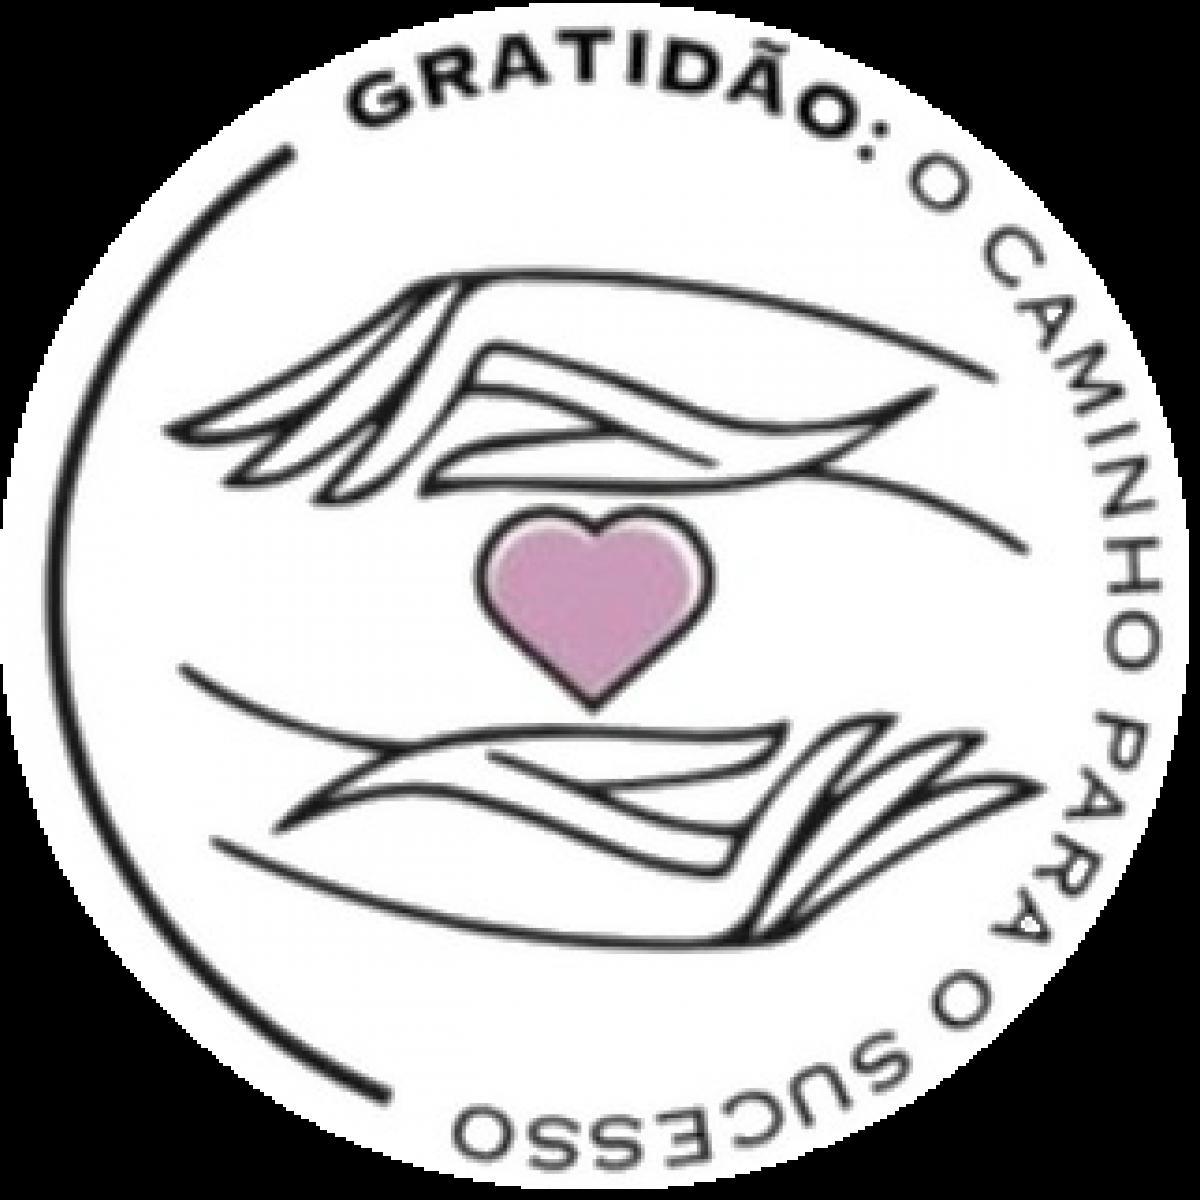 feedgratidao_2